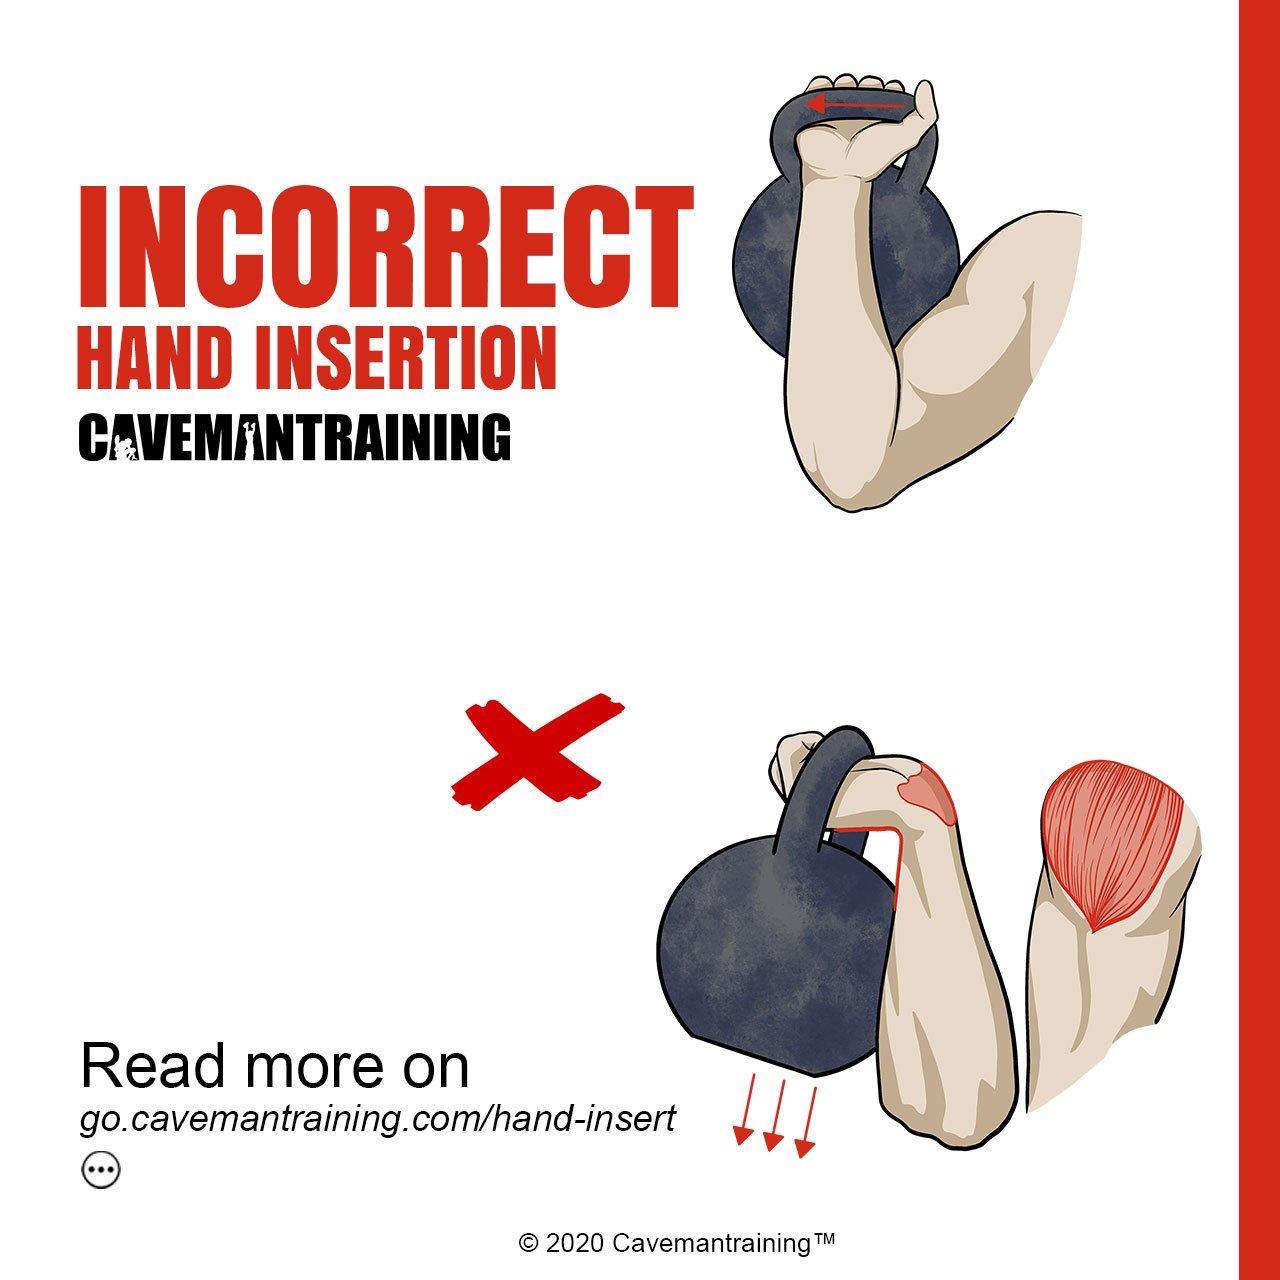 Incorrect hand insertion